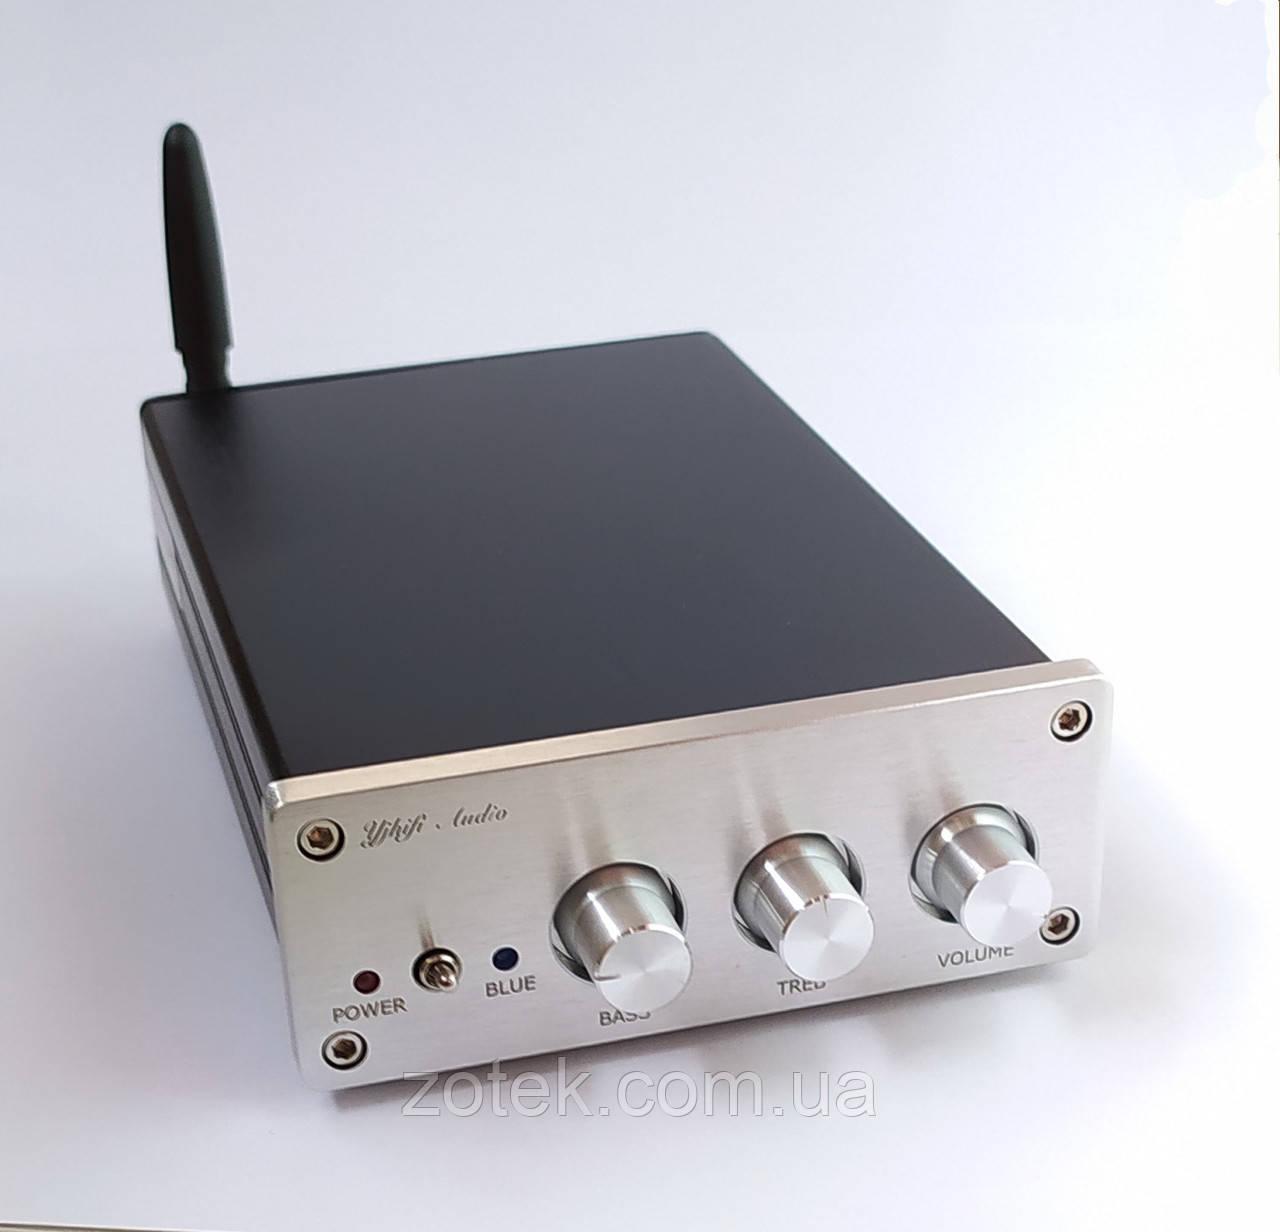 YJhifi AUDIO TPA3255 Bluetooth Усилитель звука аудио 300Вт+150Вт+150Вт 2.1 , DC 30-48В